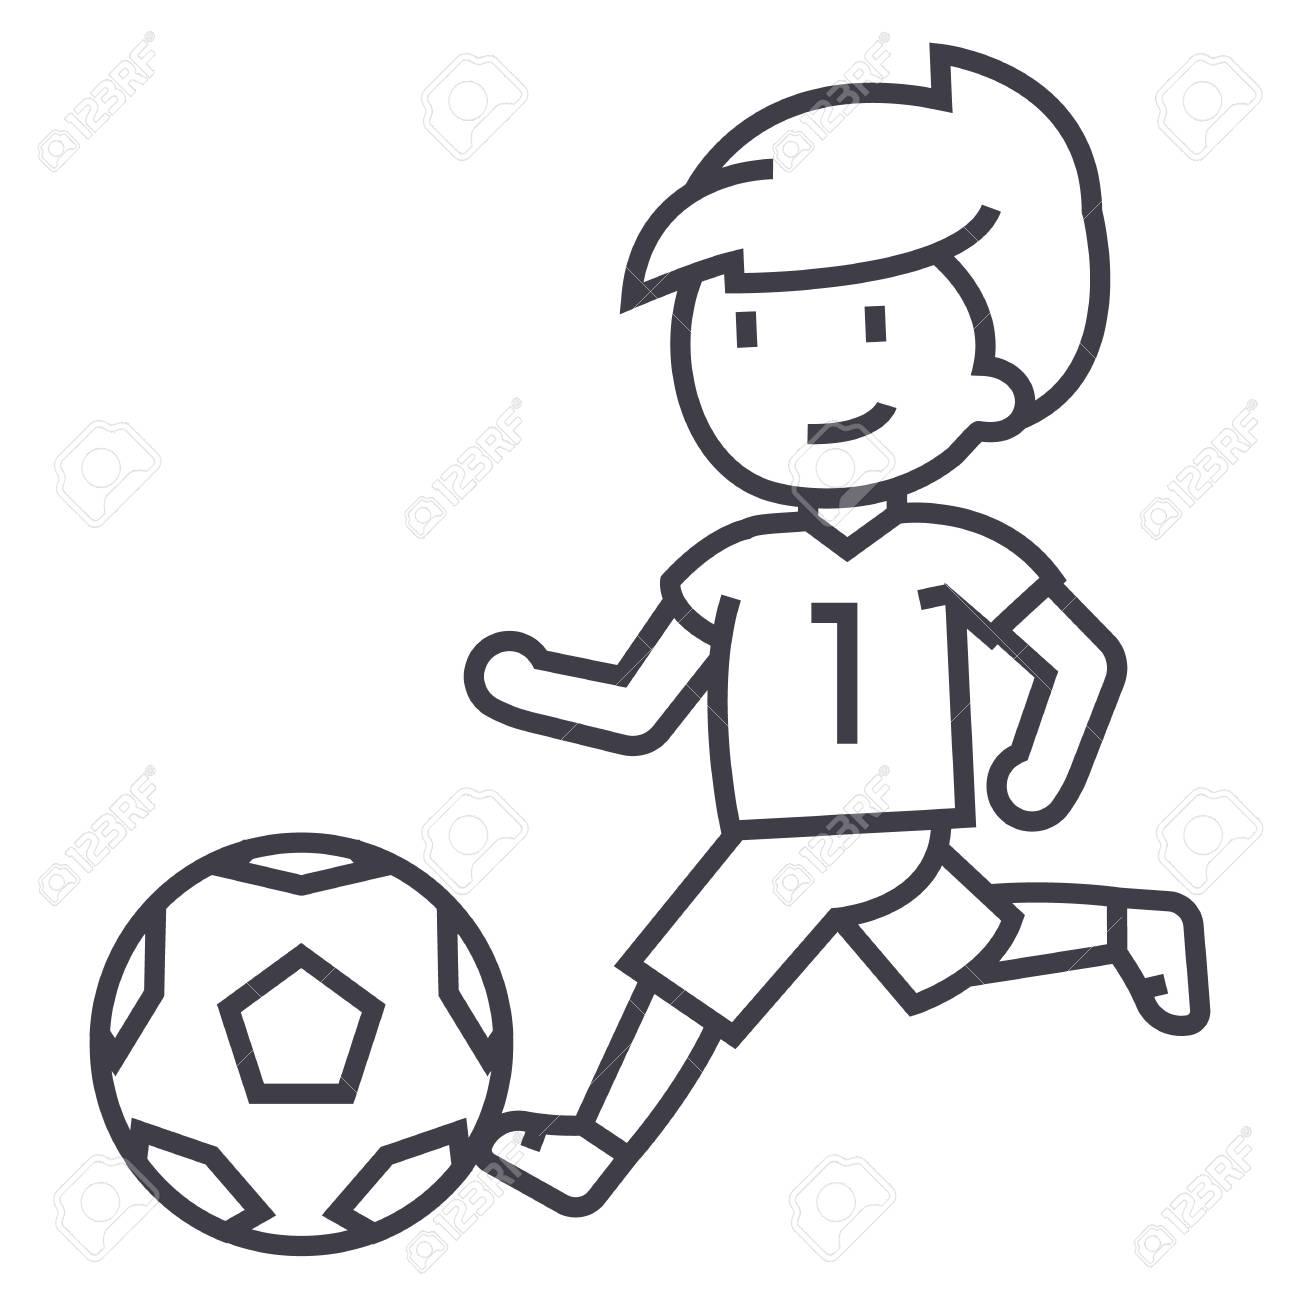 Futbol Nino Jugando Futbol Vector Linea Icono Signo Ilustracion